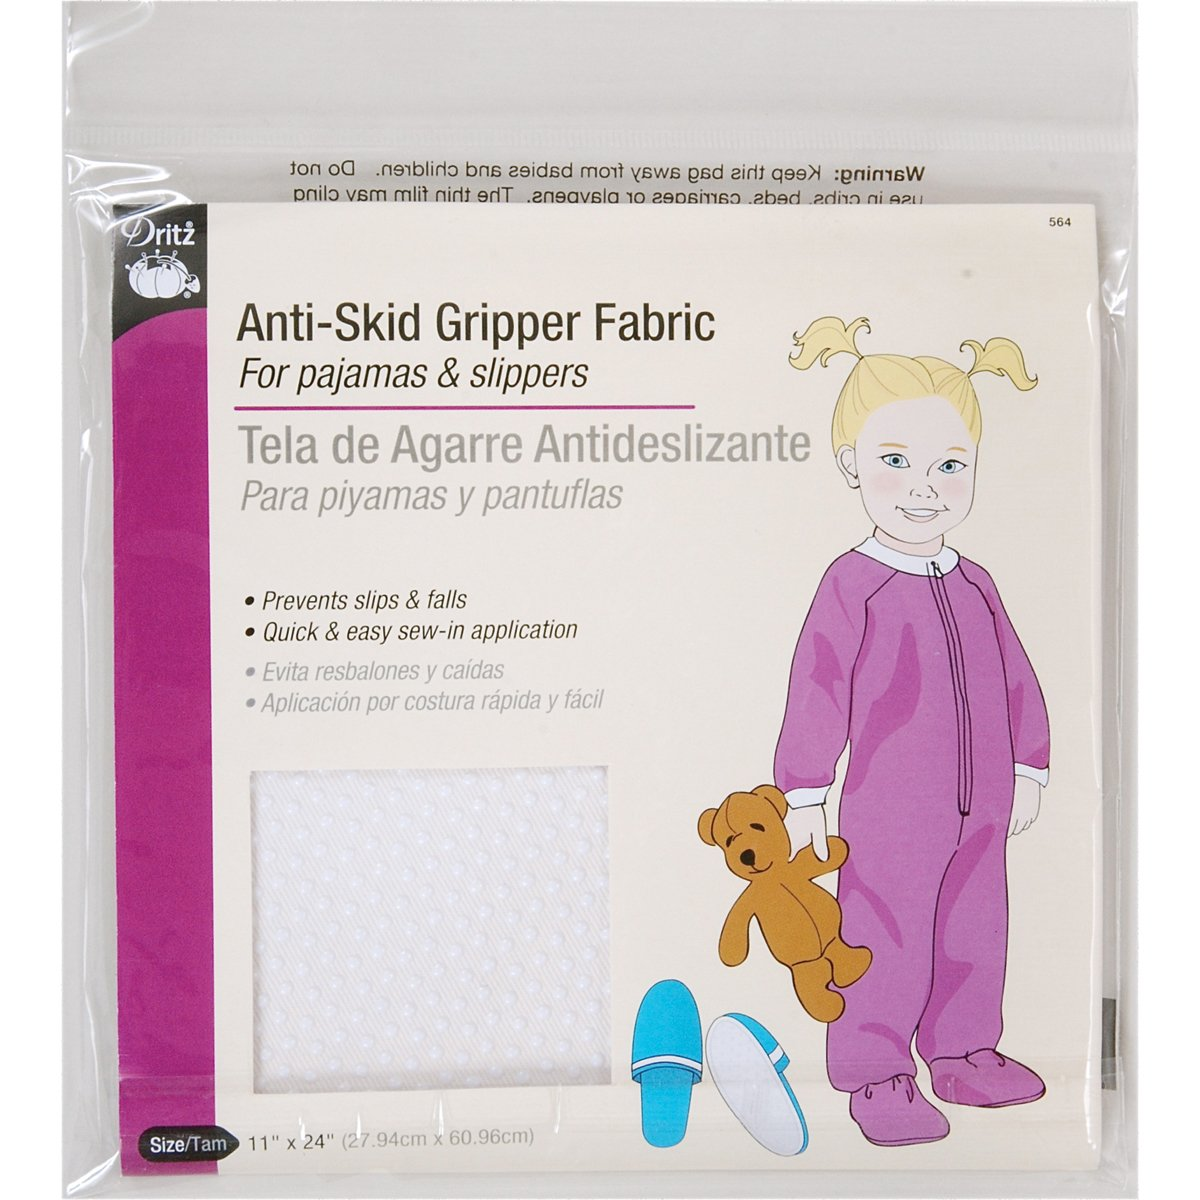 Dritz Anti Skid Gripper Fabric 564